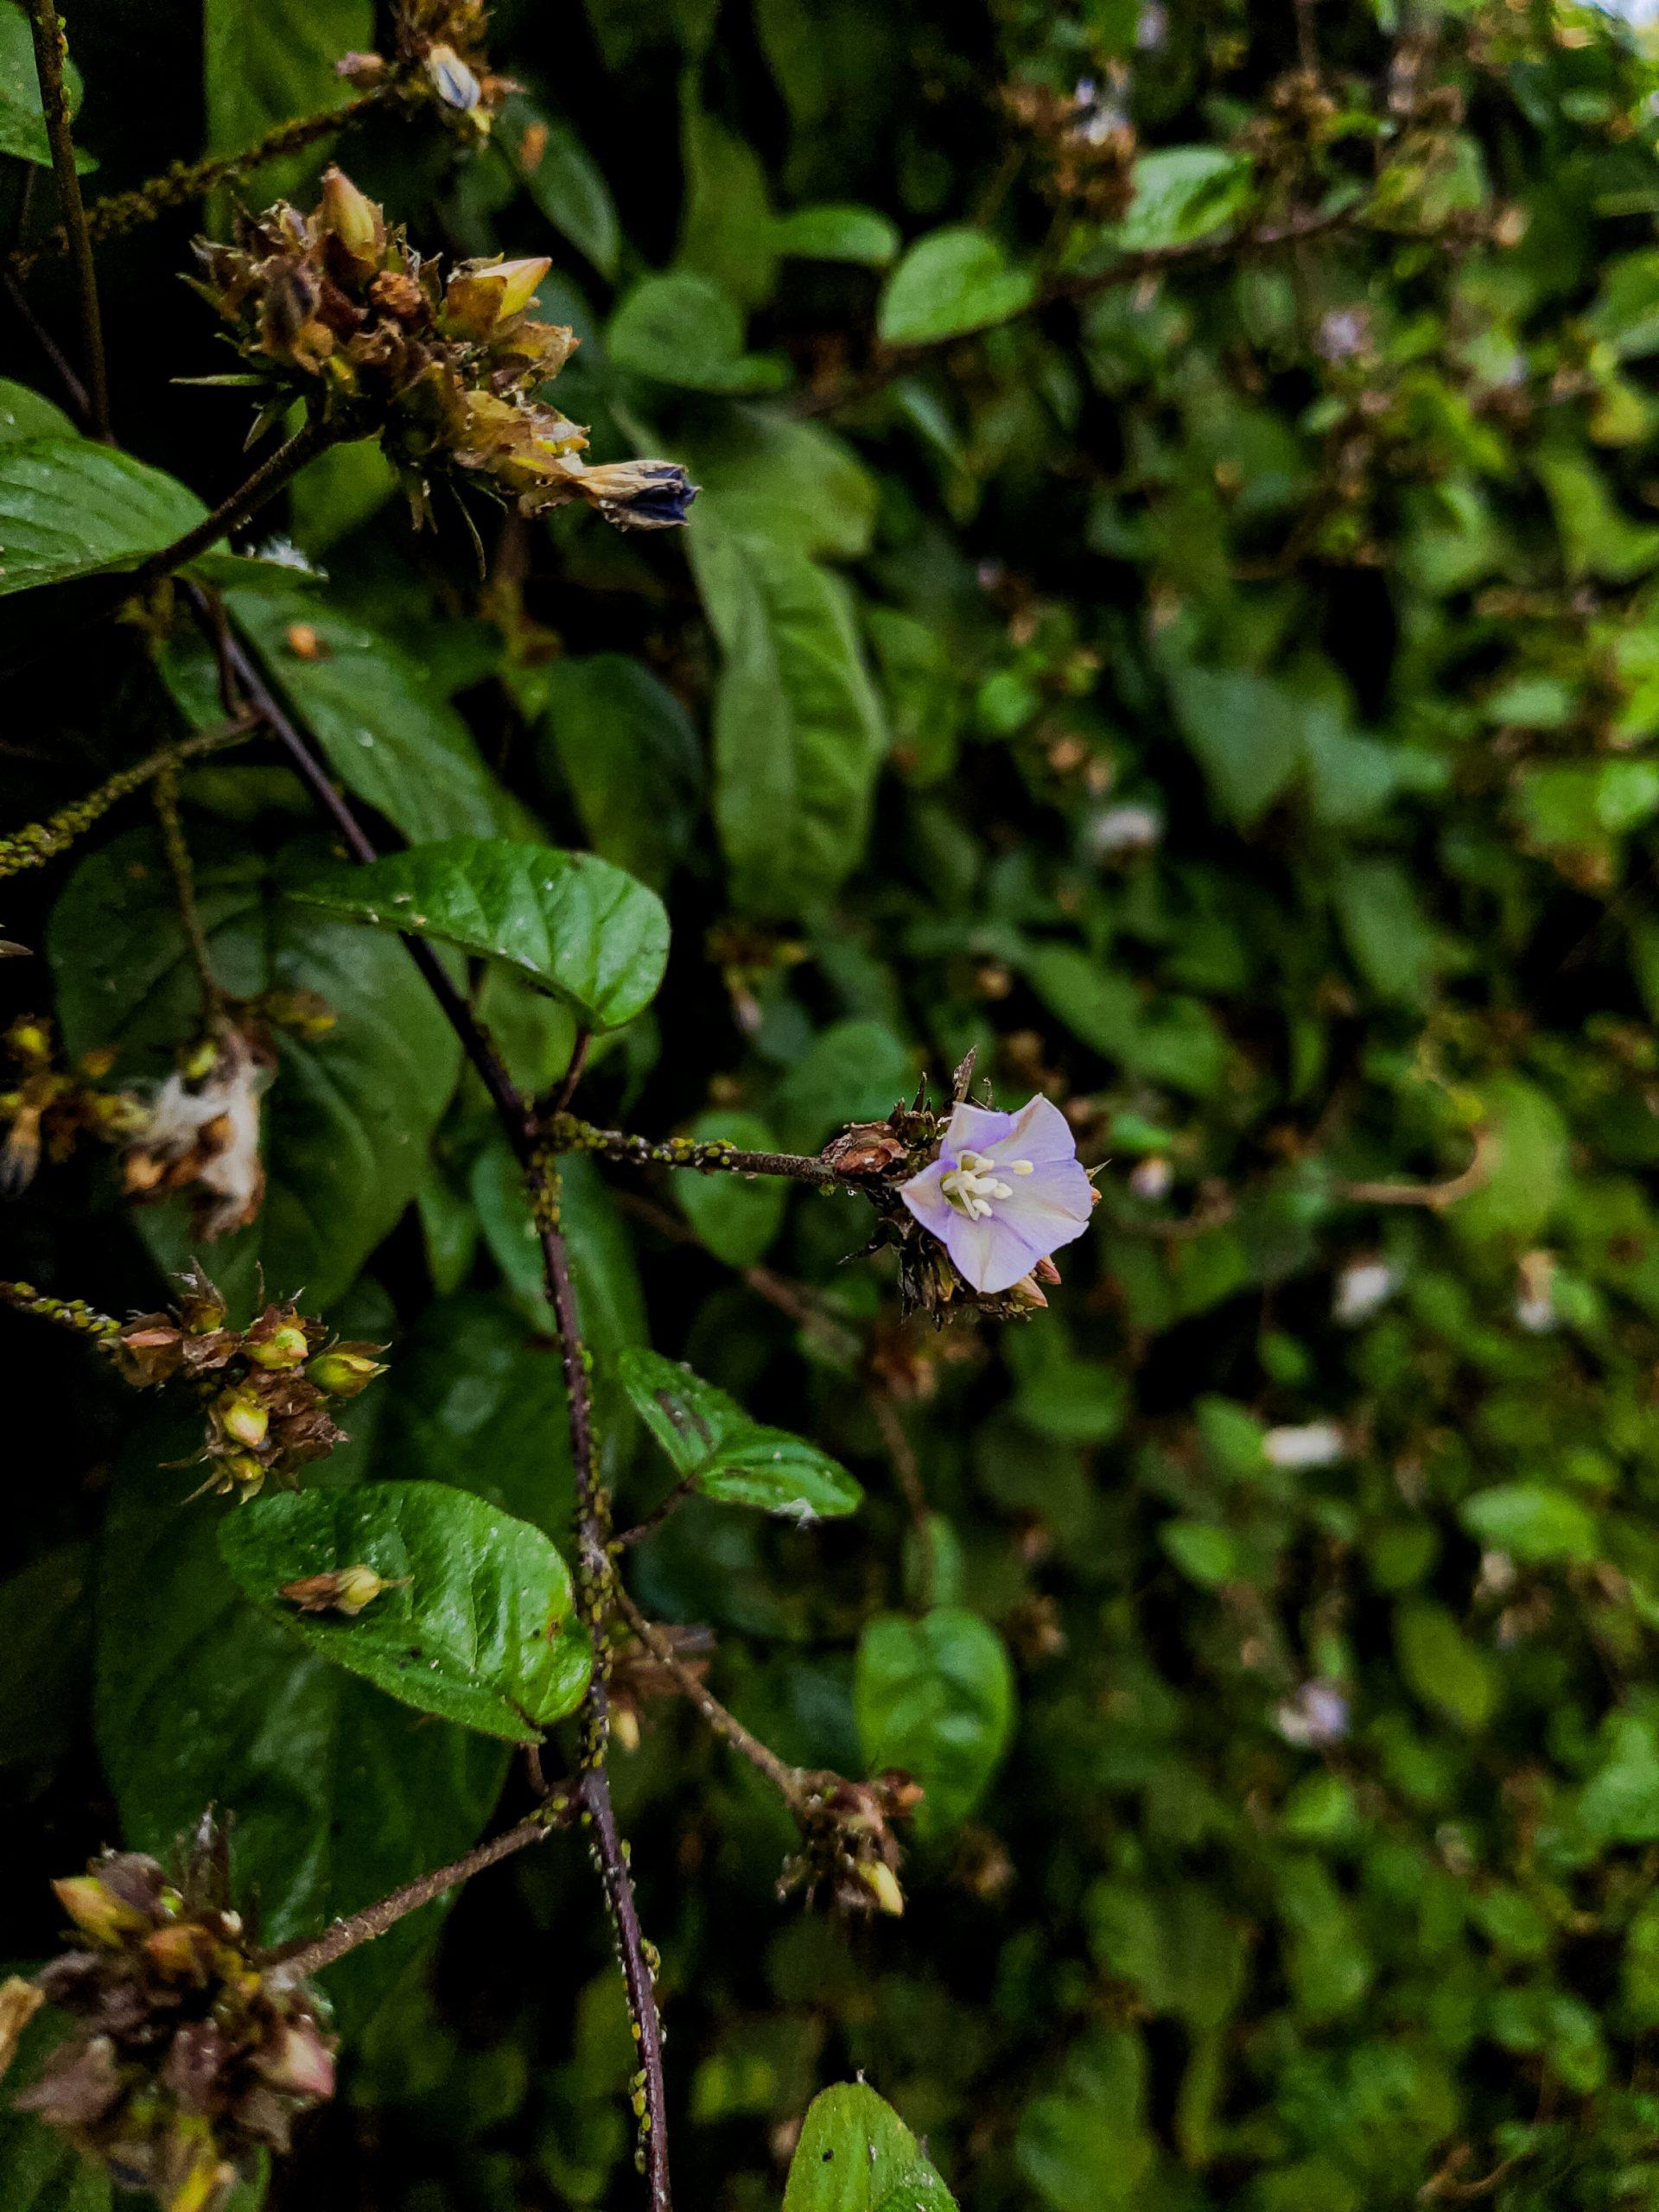 Flower on green plant